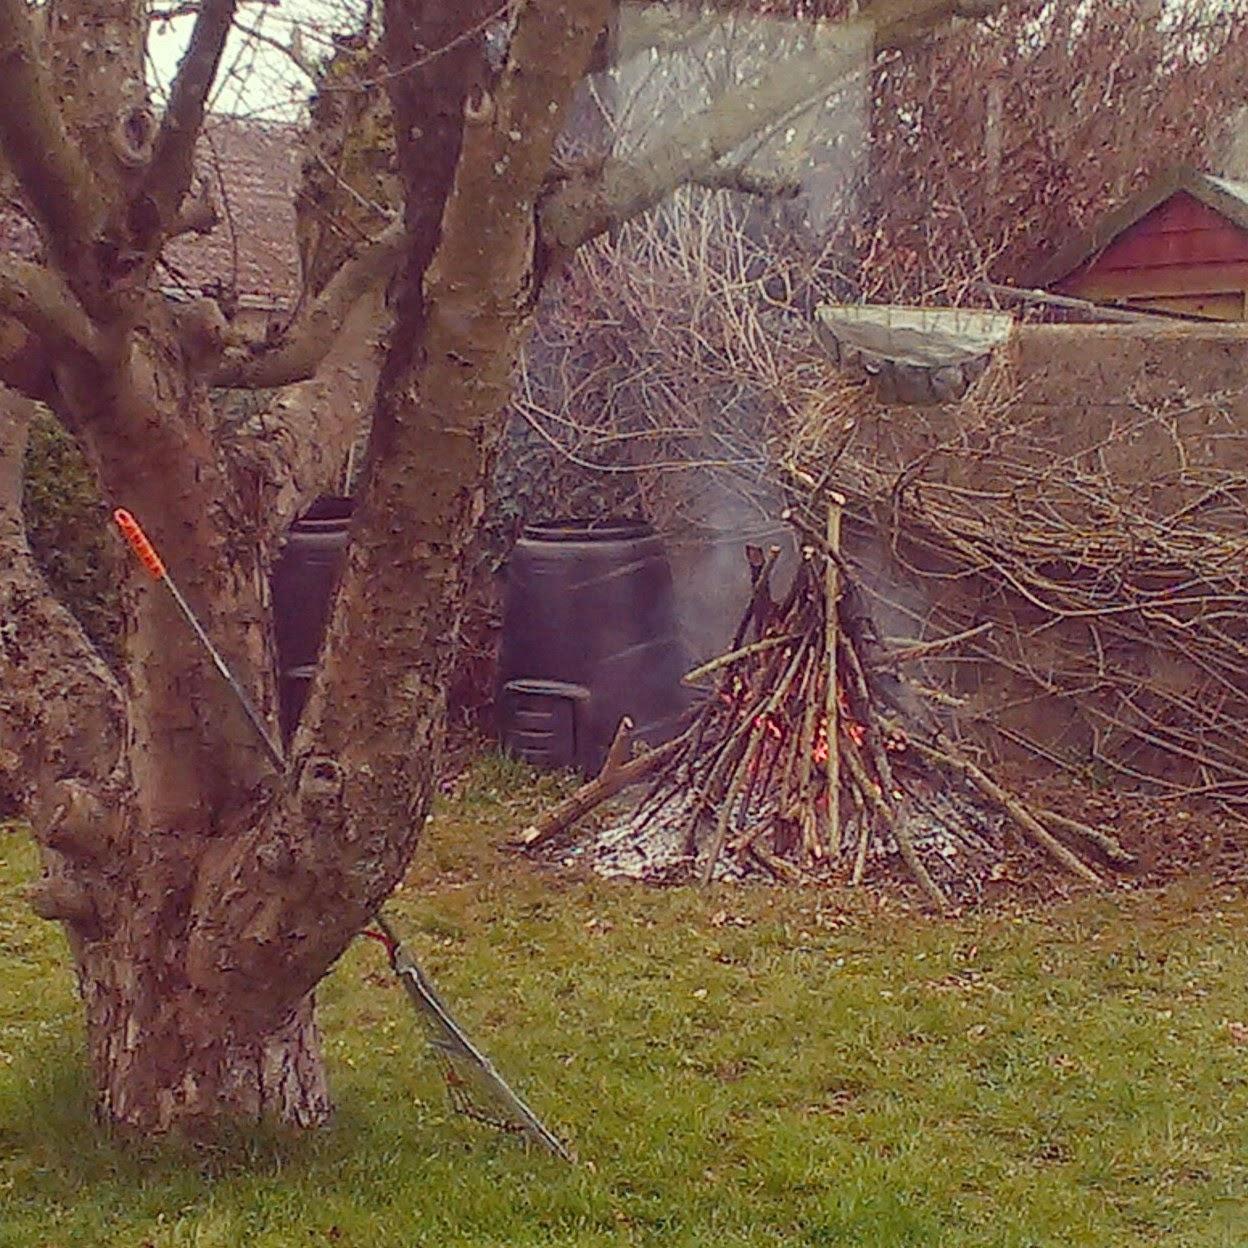 Tipi bonfire in the garden